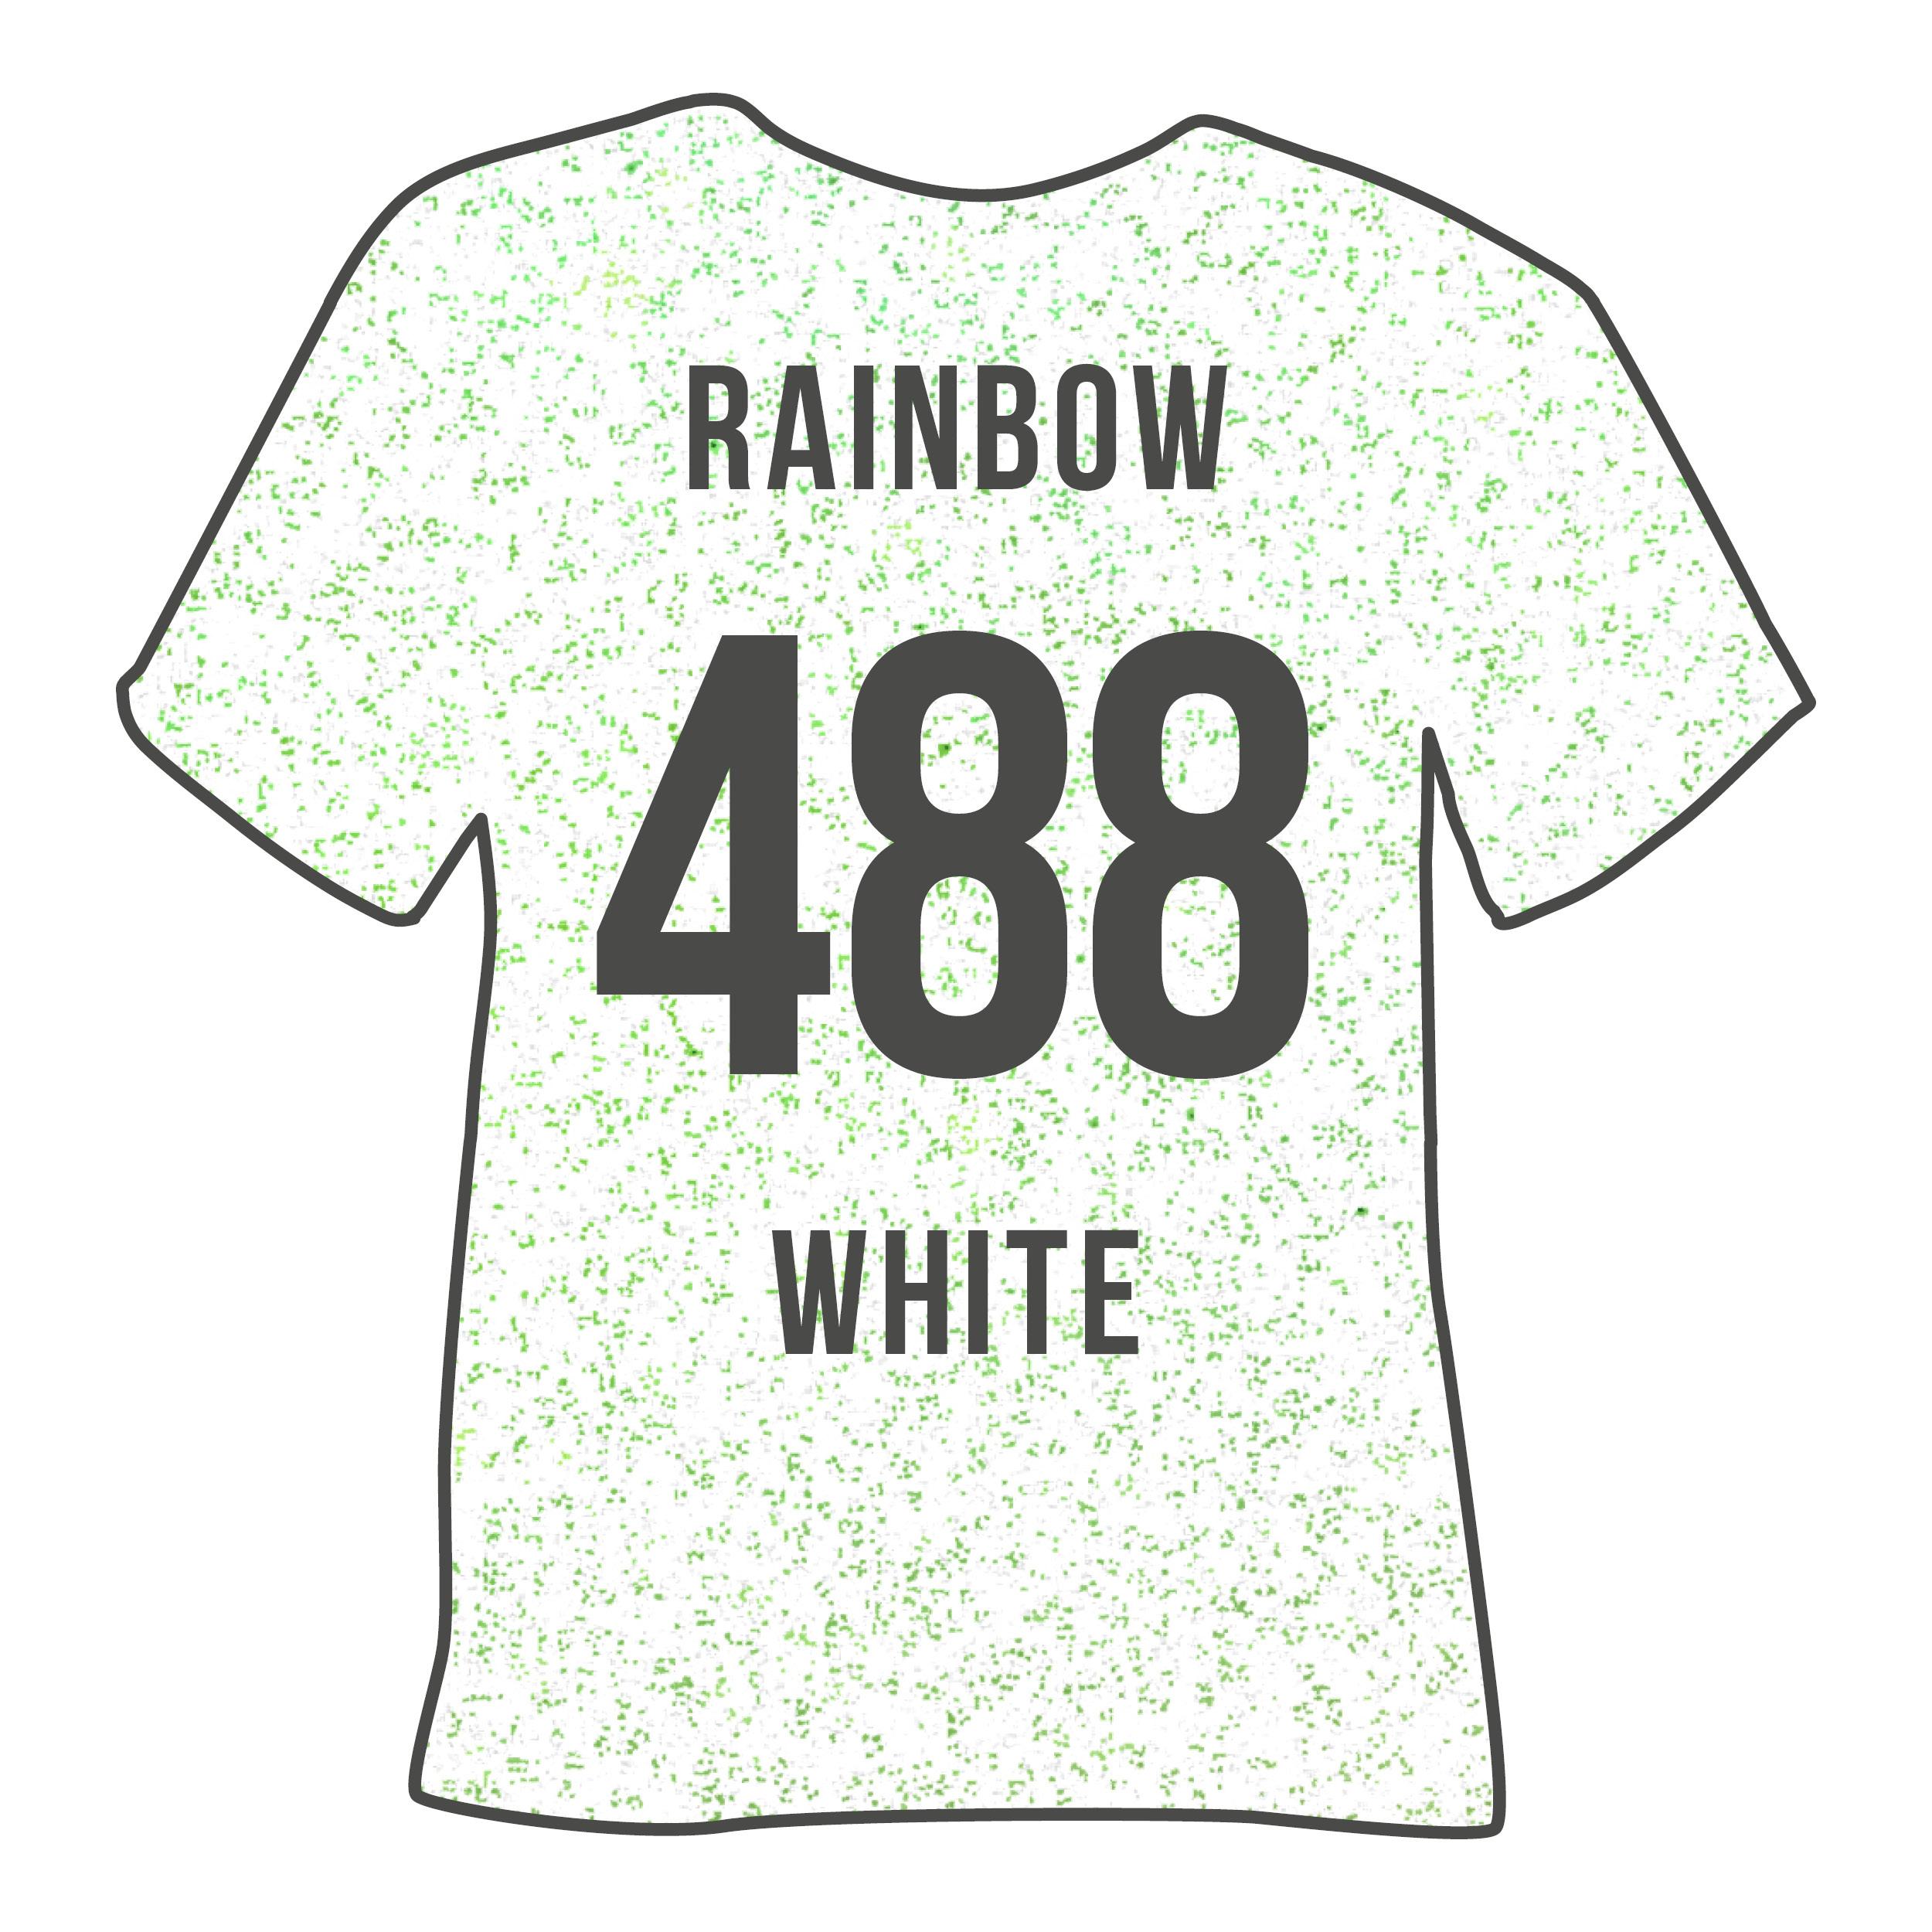 488 RAINBOW WHITE